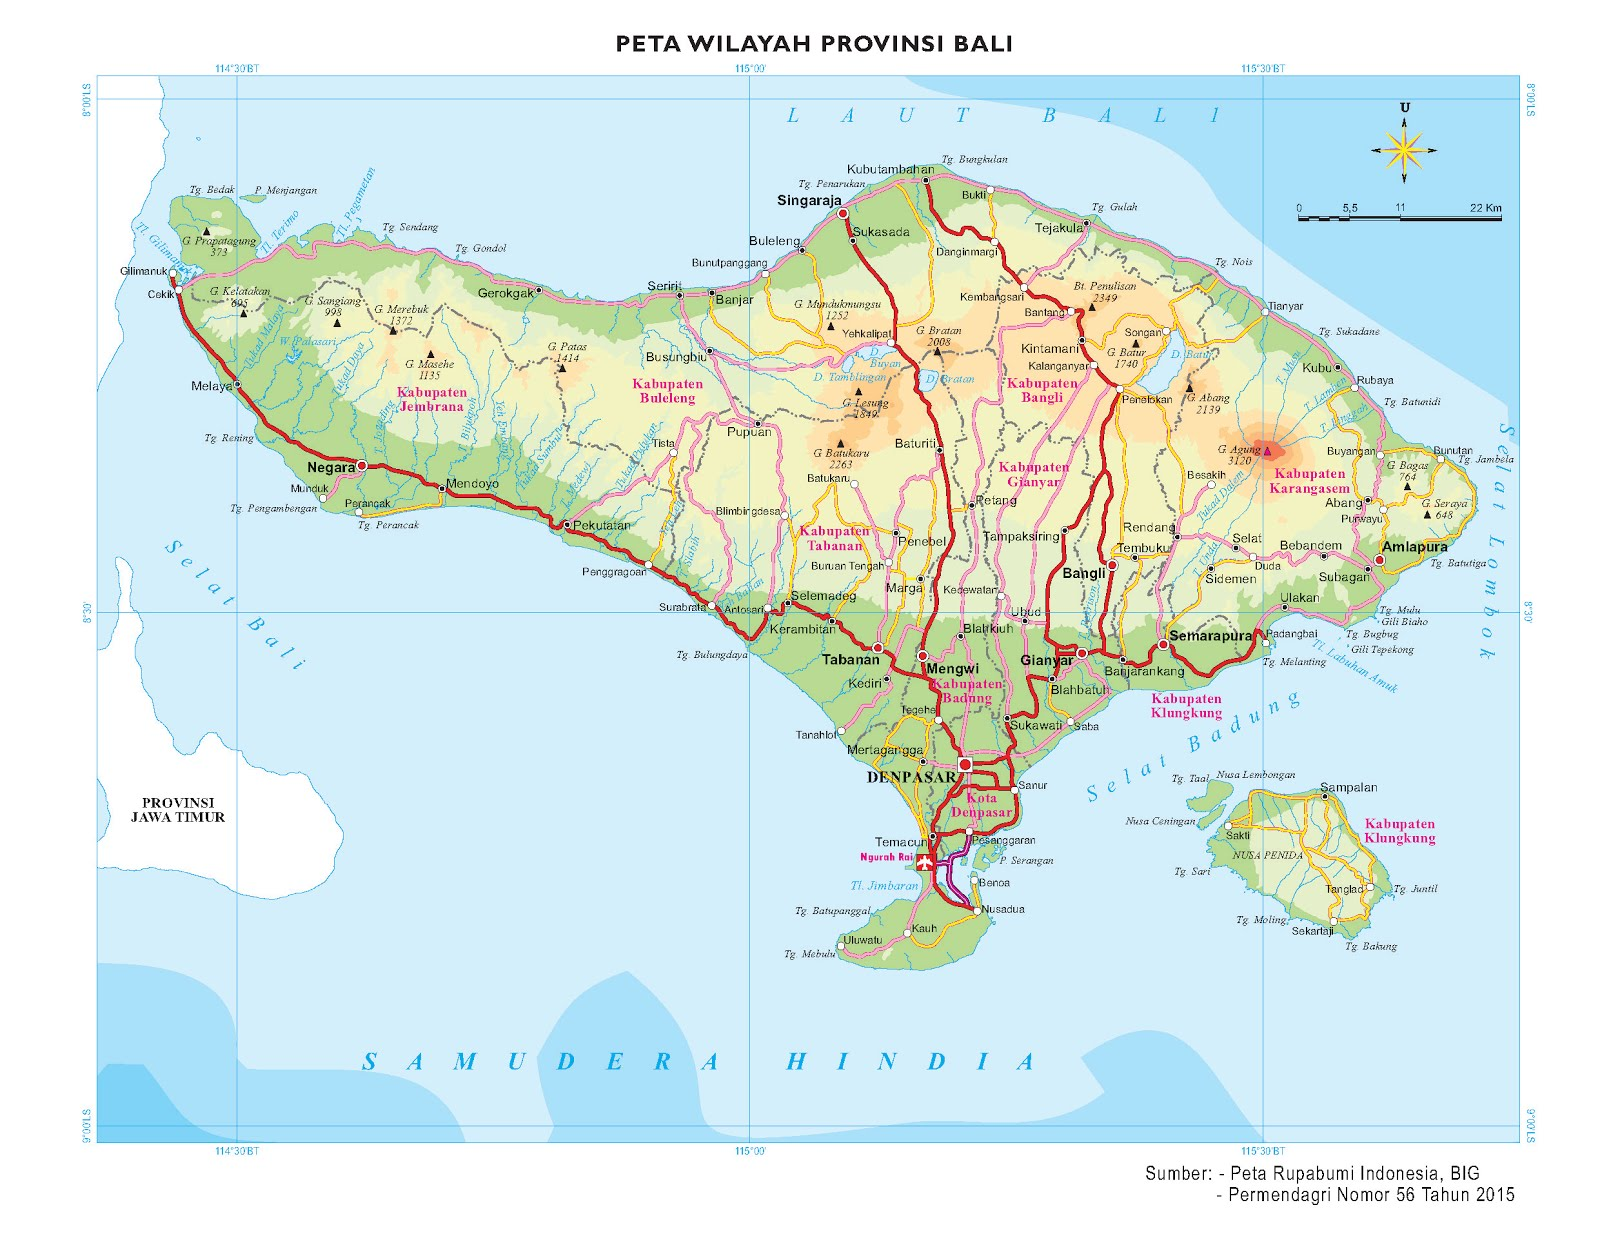 Peta Provinsi Seluruh Indonesia Edisi Terbaru Info Geospasial